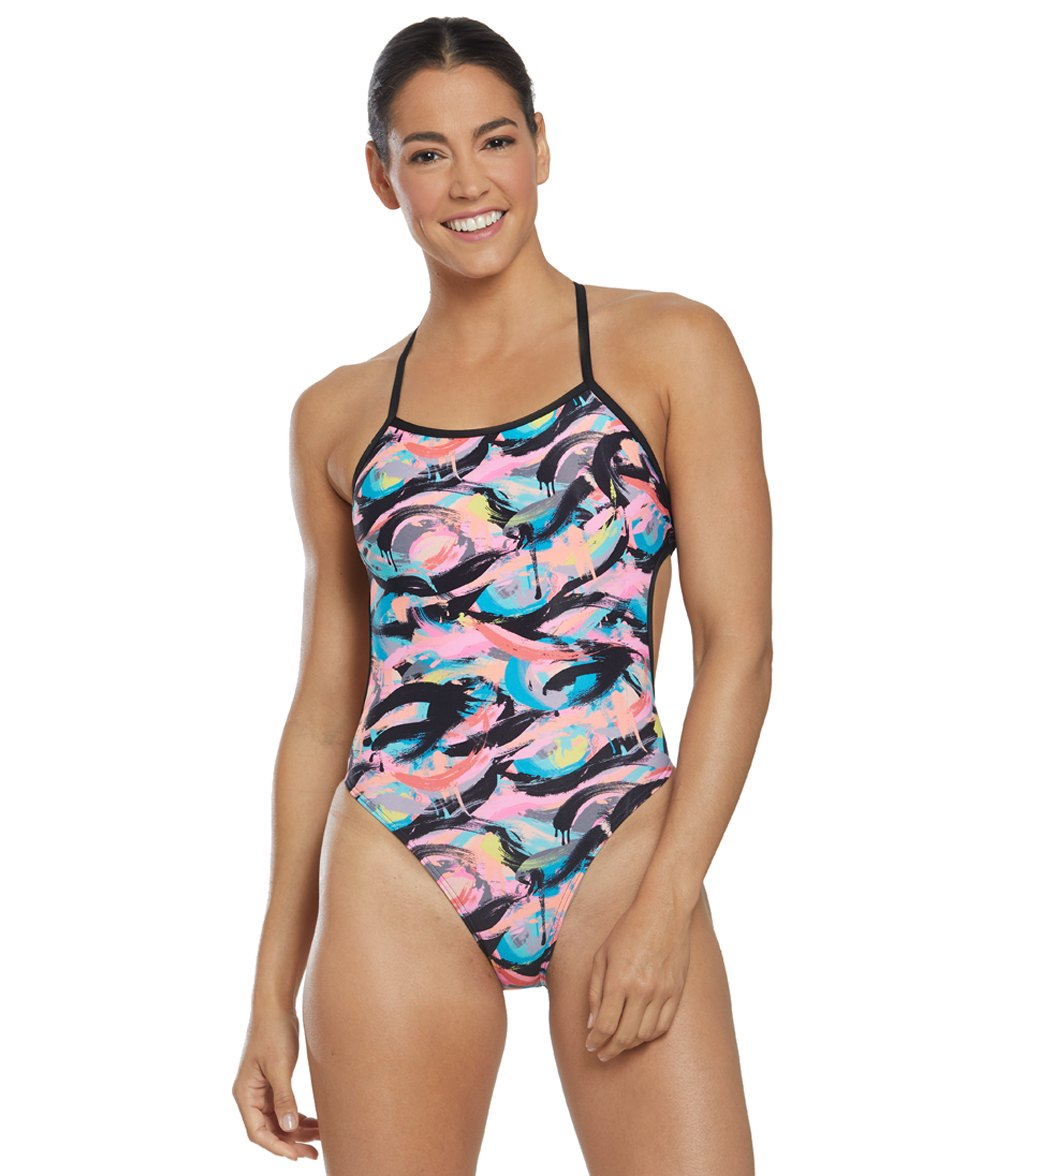 e7bf03ba7f Funkita Women's Crazy Painter Cut Away One Piece Swimsuit